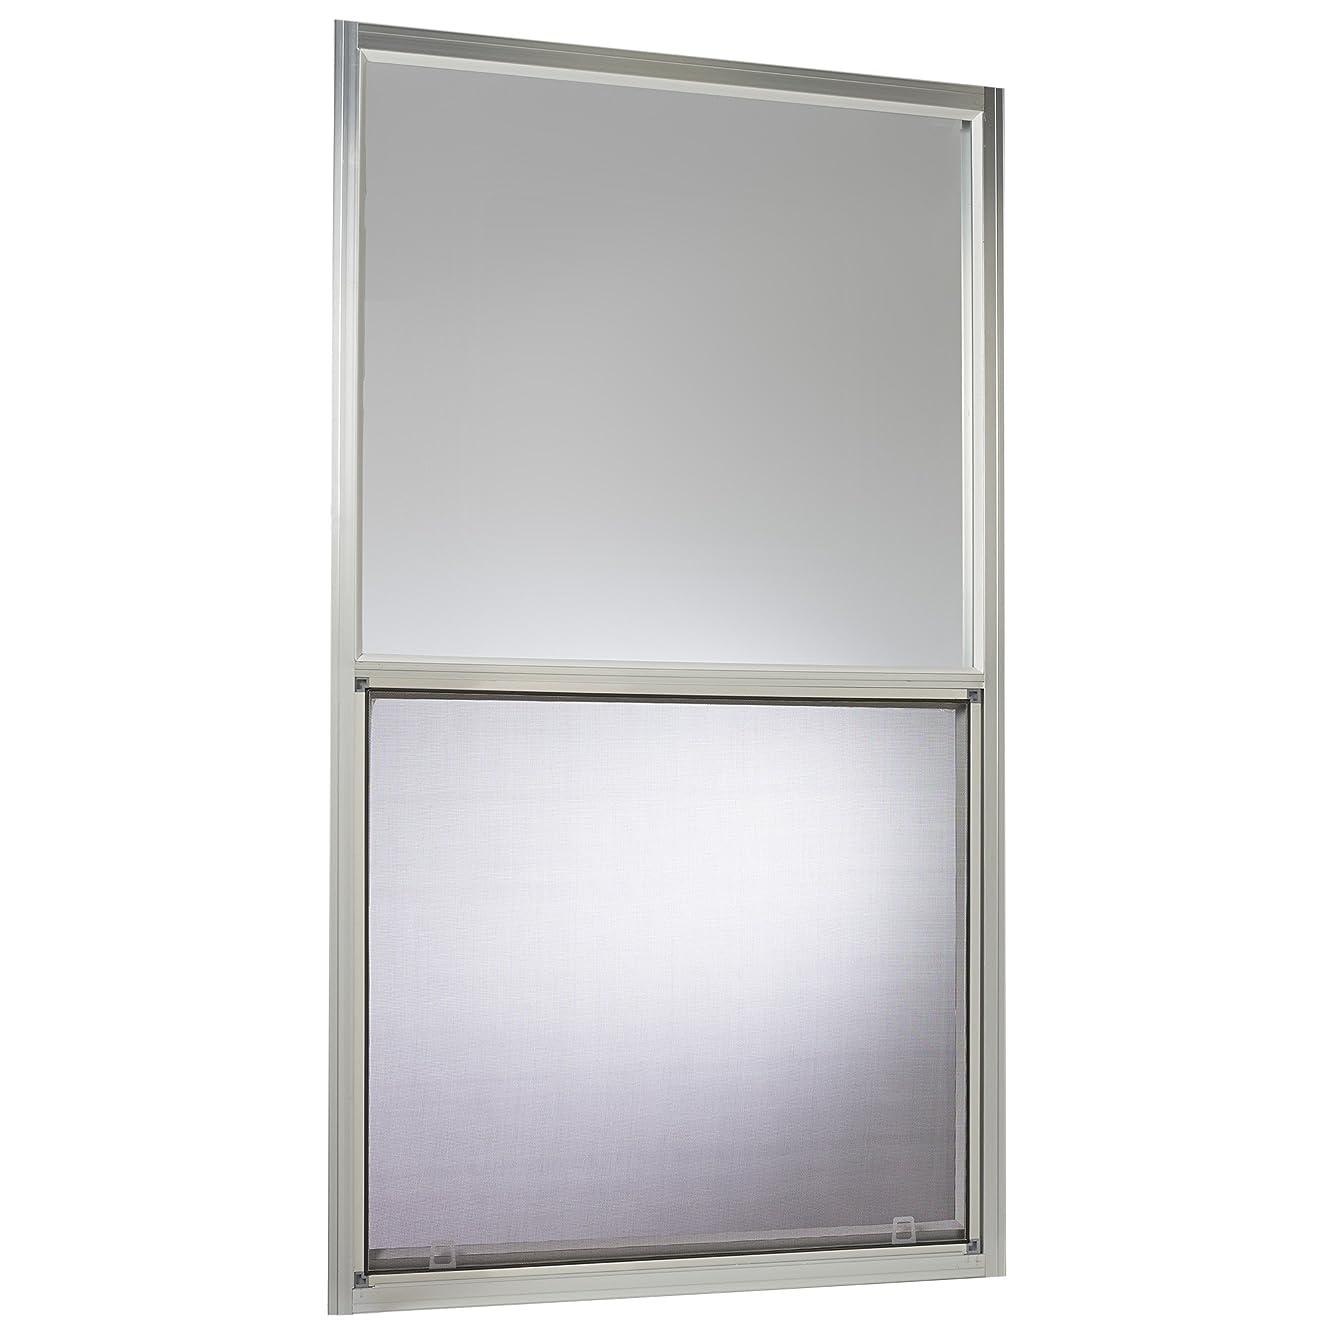 Park Ridge Products AMHMF3054PR Park Ridge Mill Finish 30 in. x 54 in. Aluminum Mobile Home Single Hung Window – Silver,